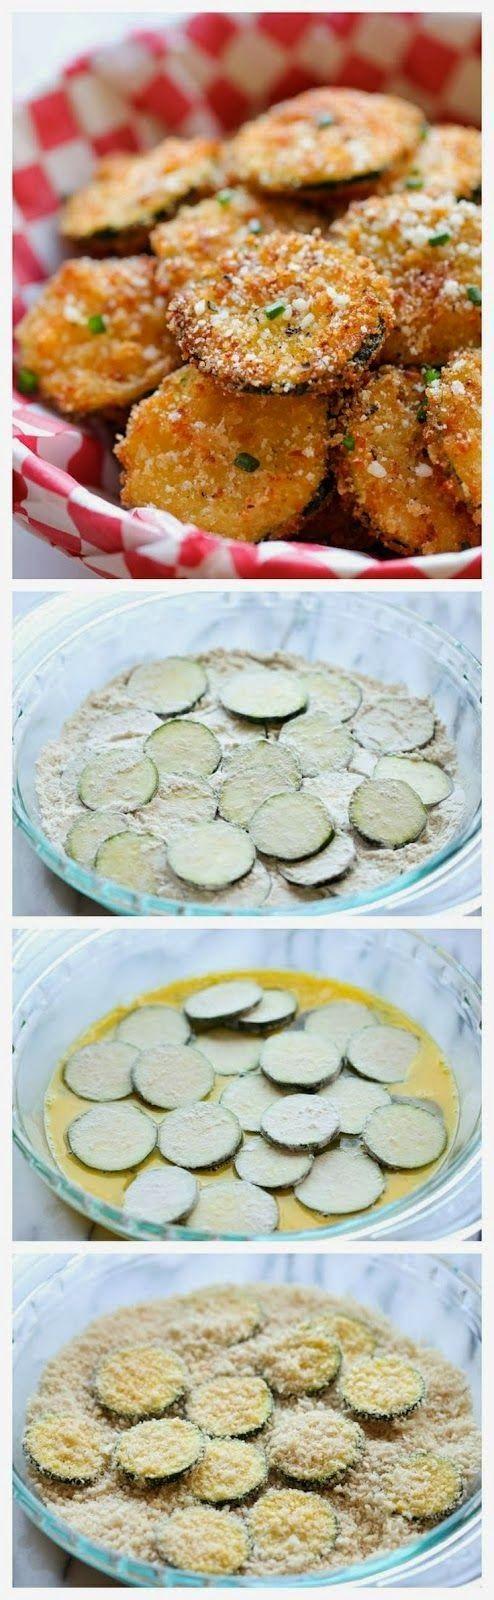 Zucchini Parmesan Crisps | Recipes And Health